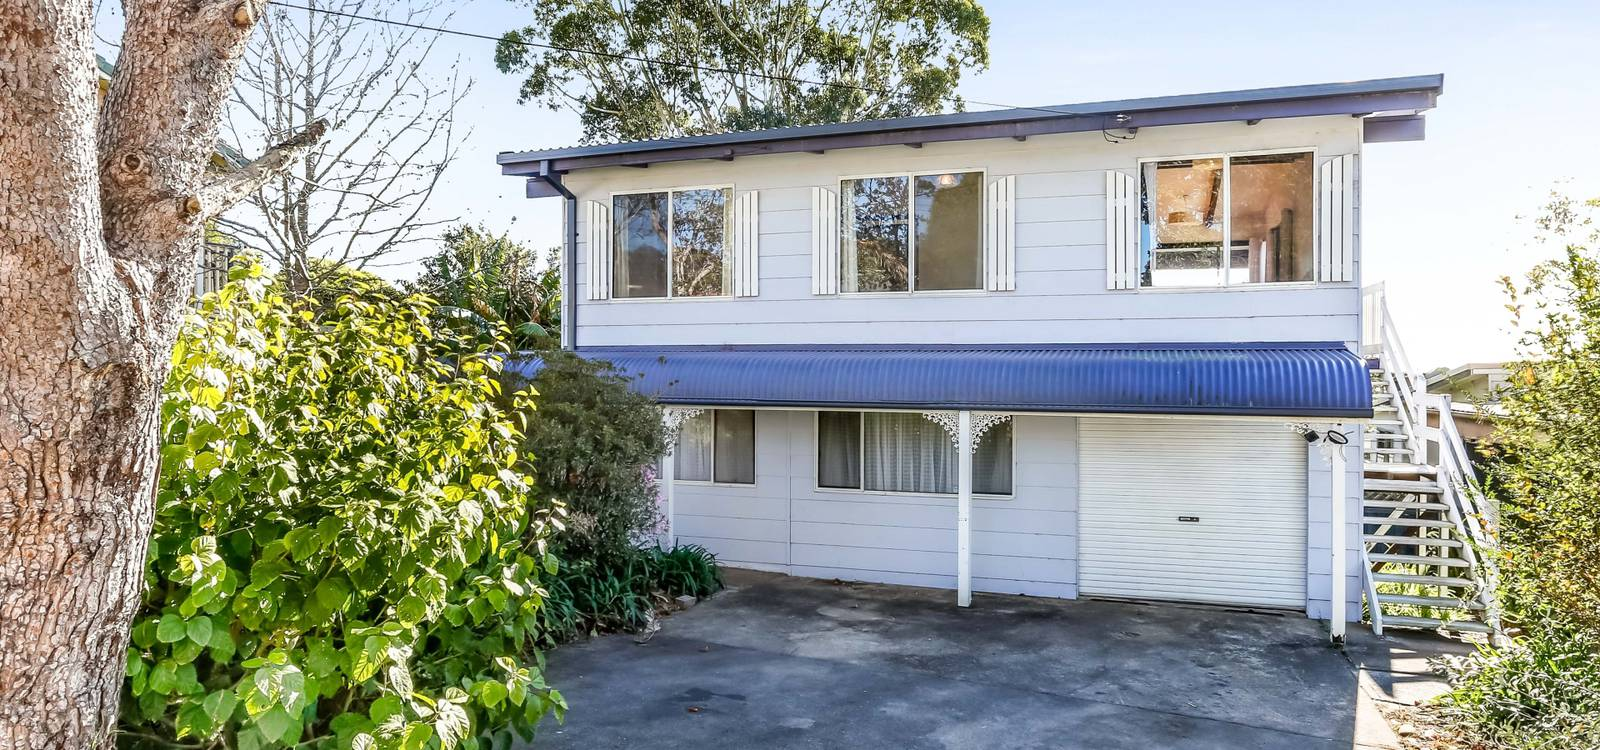 94 Bondi Street TUROSS HEAD, NSW 2537 - photo 1